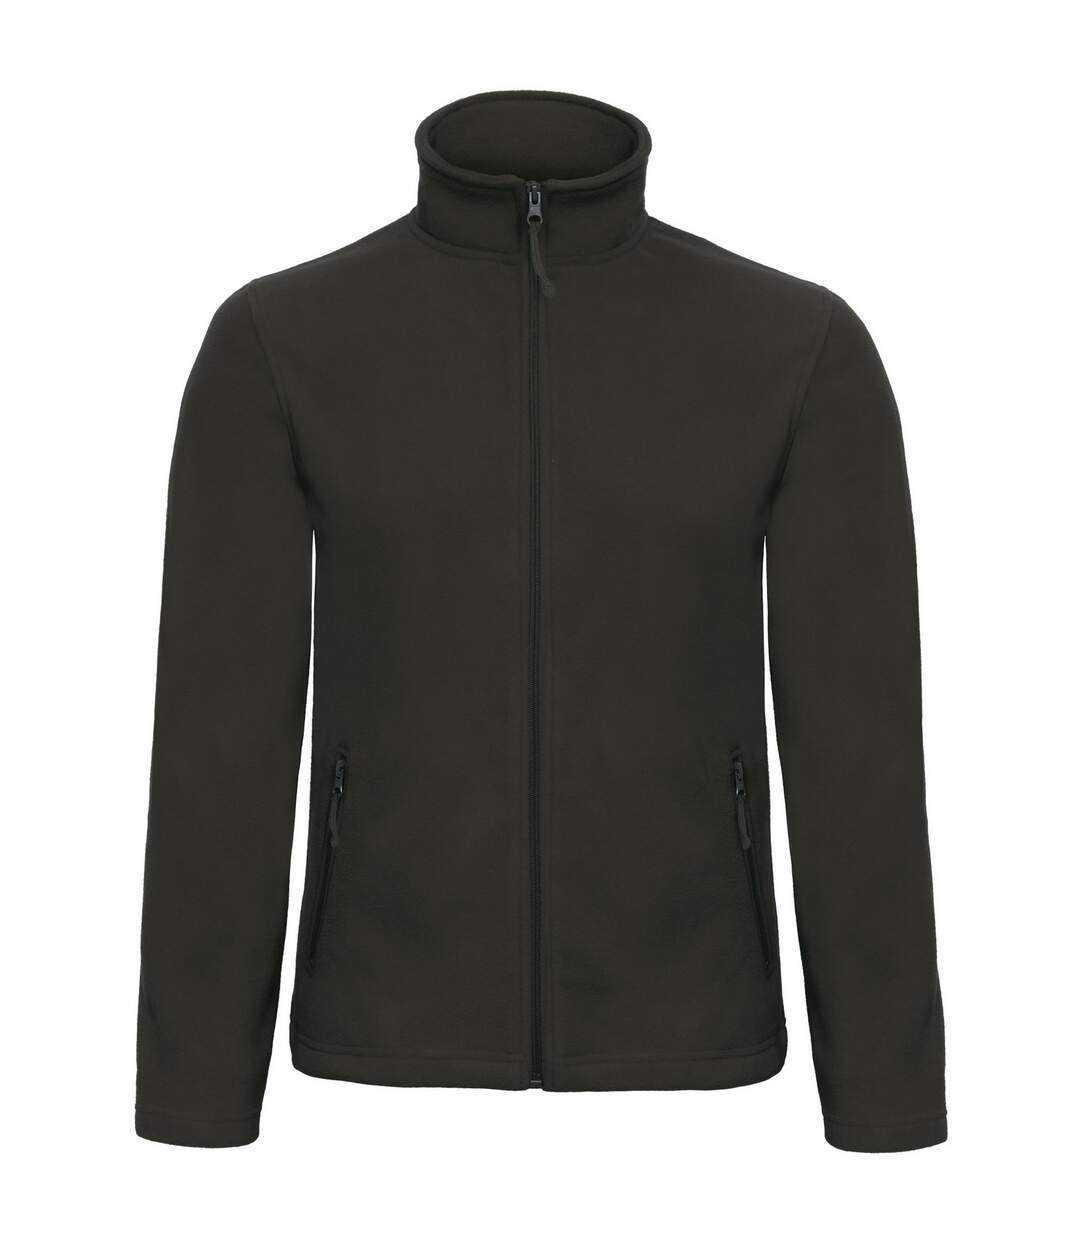 B&C Collection Mens ID 501 Microfleece Jacket (Red) - UTRW3527